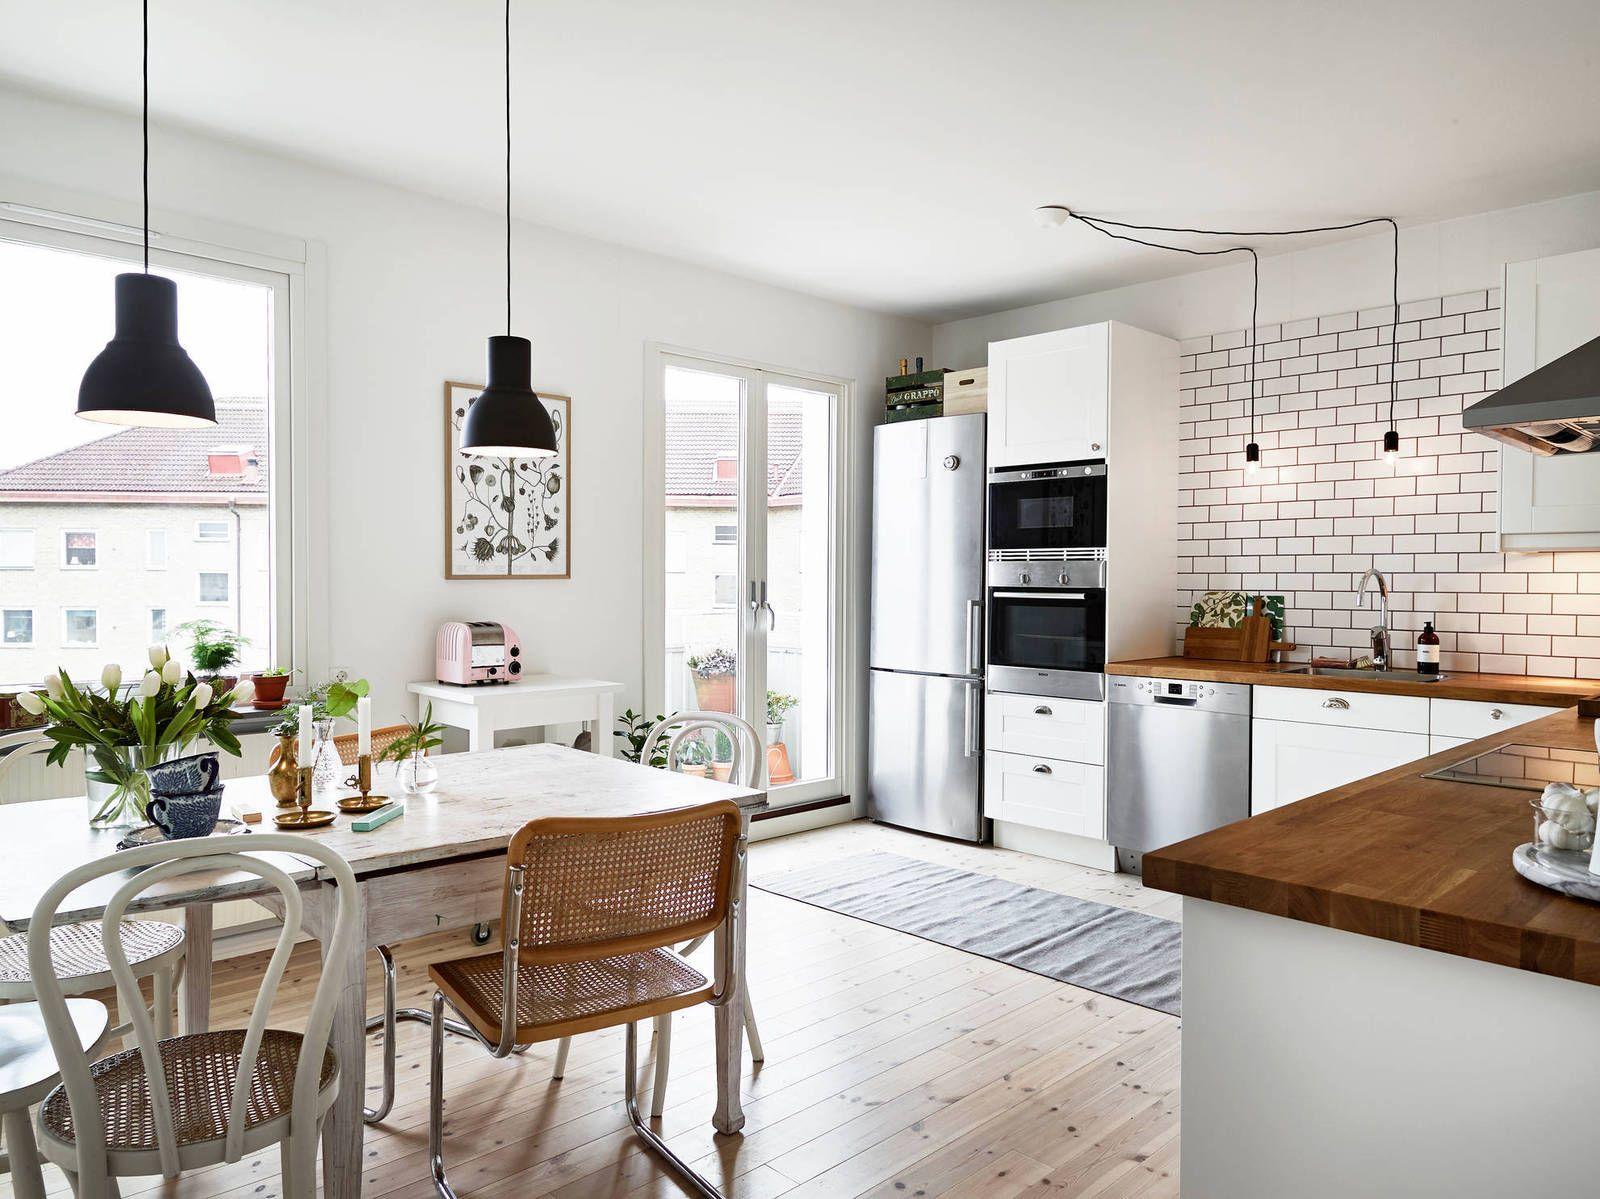 Hektar Ikea Lamp Google Search Eldh S Pinterest Bajo  ~ Decorar Apartamento Pequeño Ikea